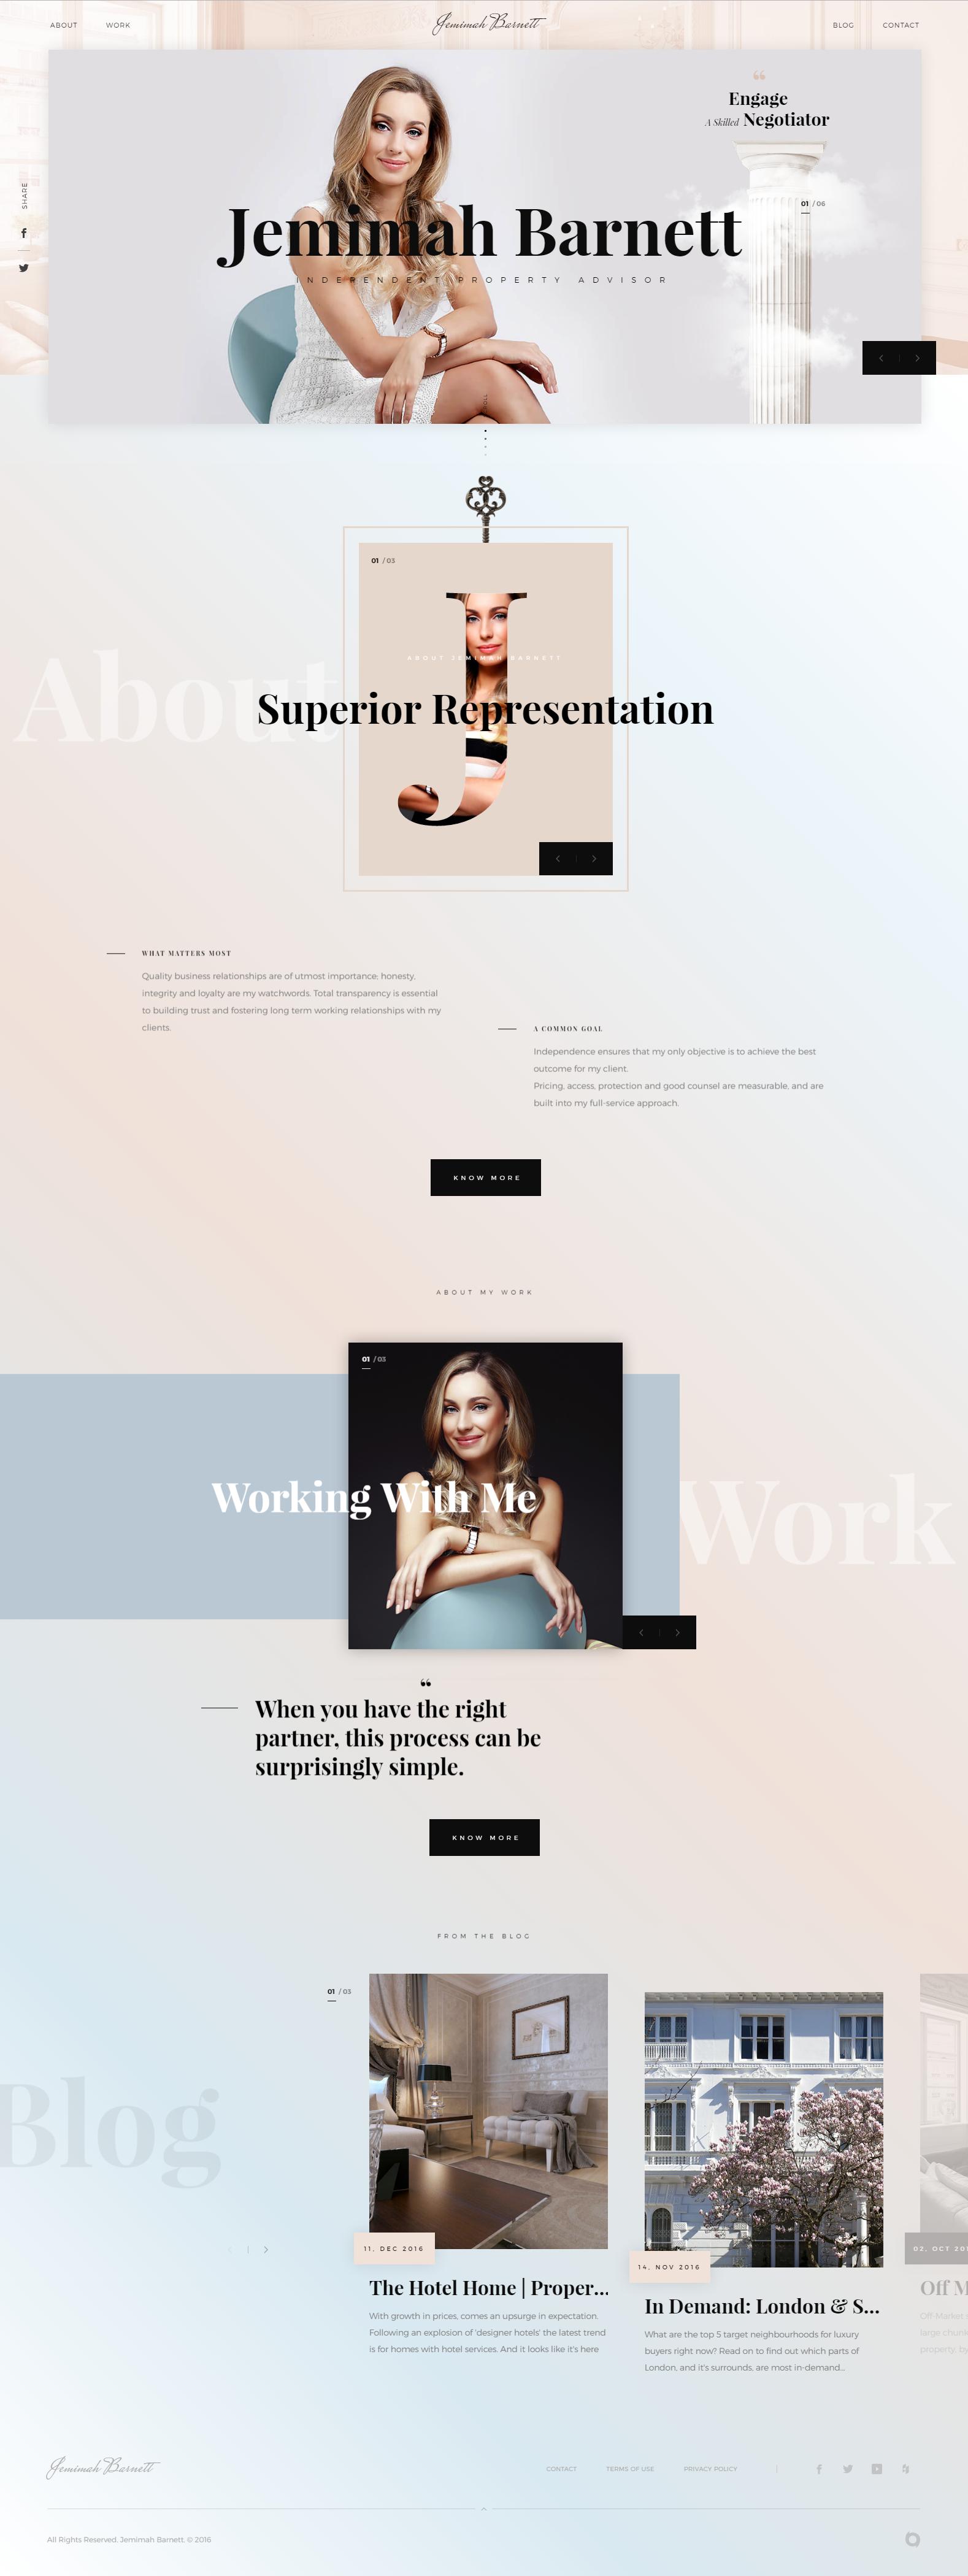 Jemimah Barnett Personal Web mentioned at @designersbyte for #DesignInspiration https://designersbyte.com/jemimah-barnett-personal-web/